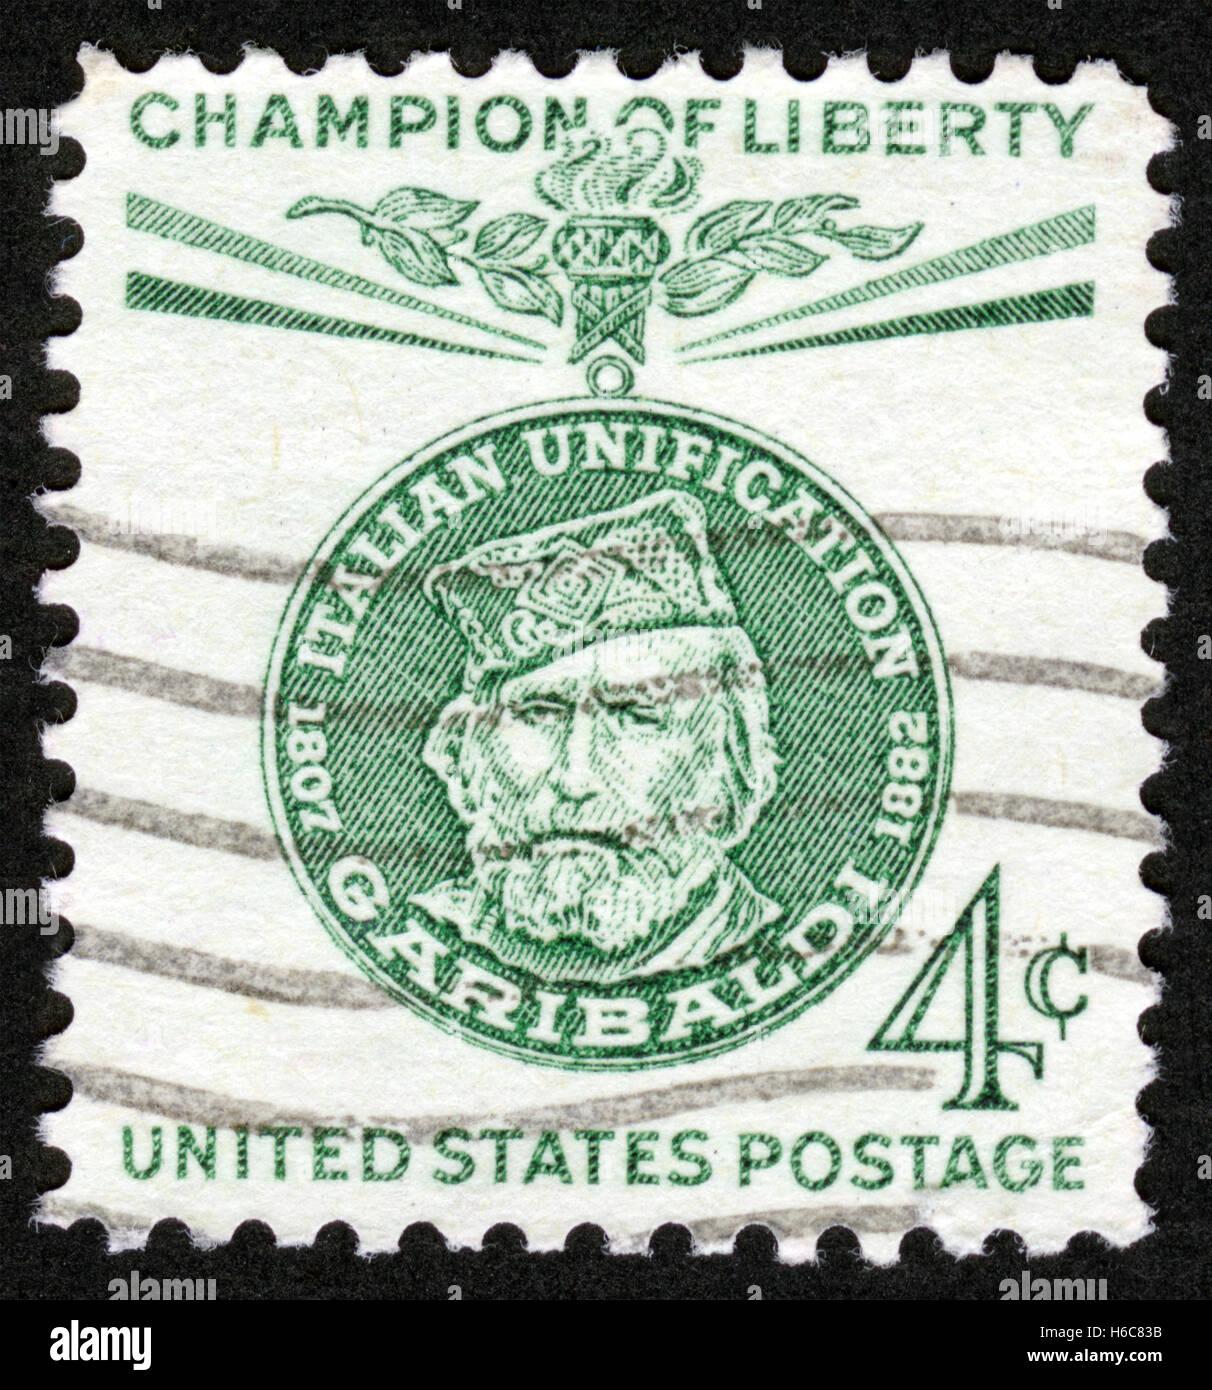 UScirca 1960 Postage Stamp Champion Liberty Garibaldi 1807 1882 Medal Italian Unification